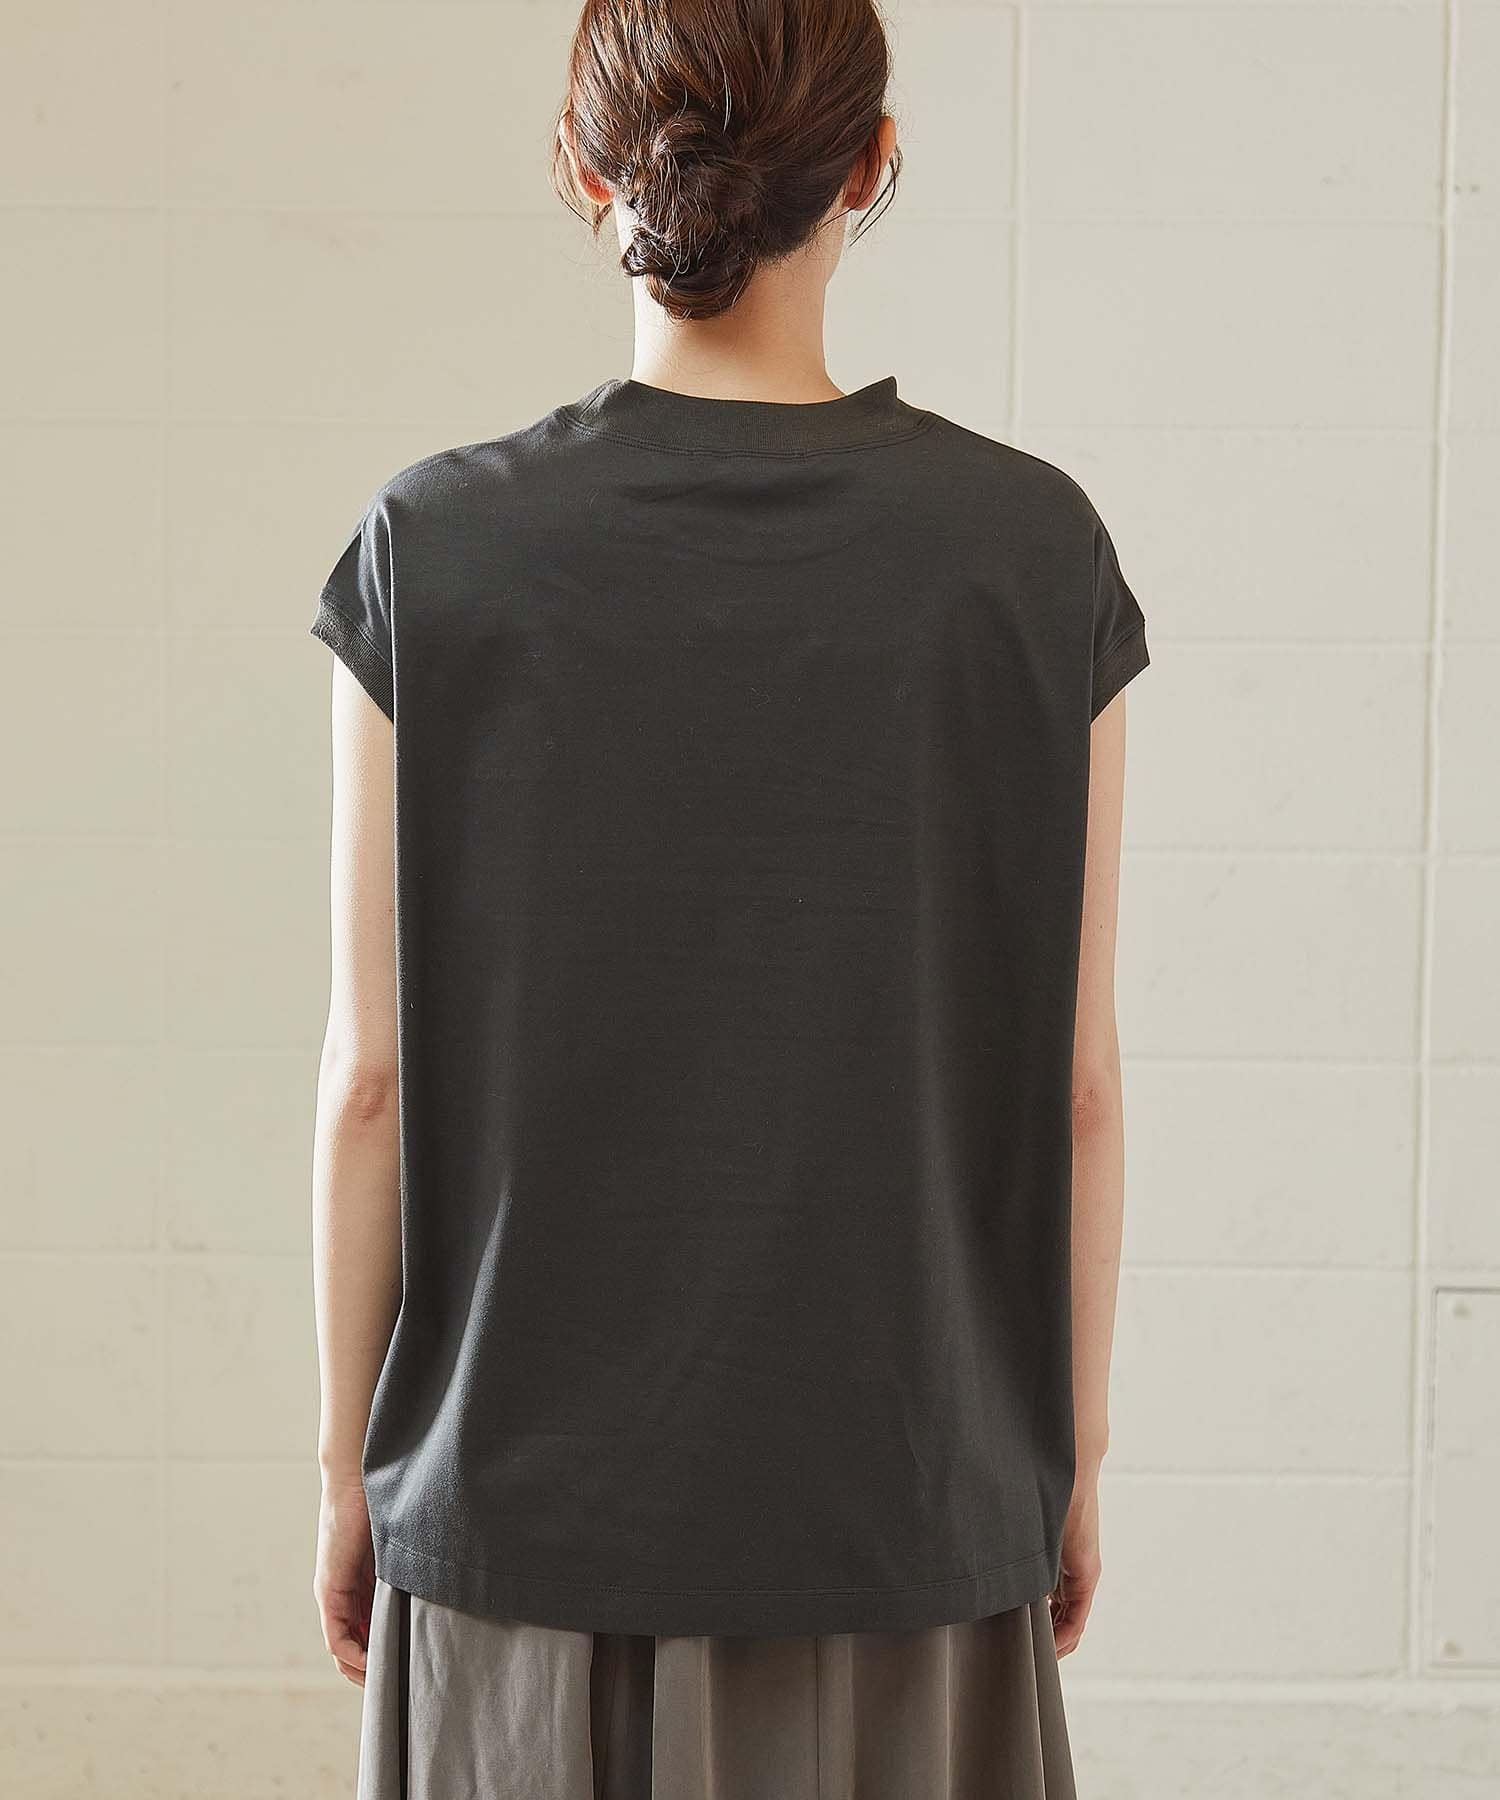 OUVRAGE CLASSE(ウヴラージュクラス) Felicity ロゴTシャツ